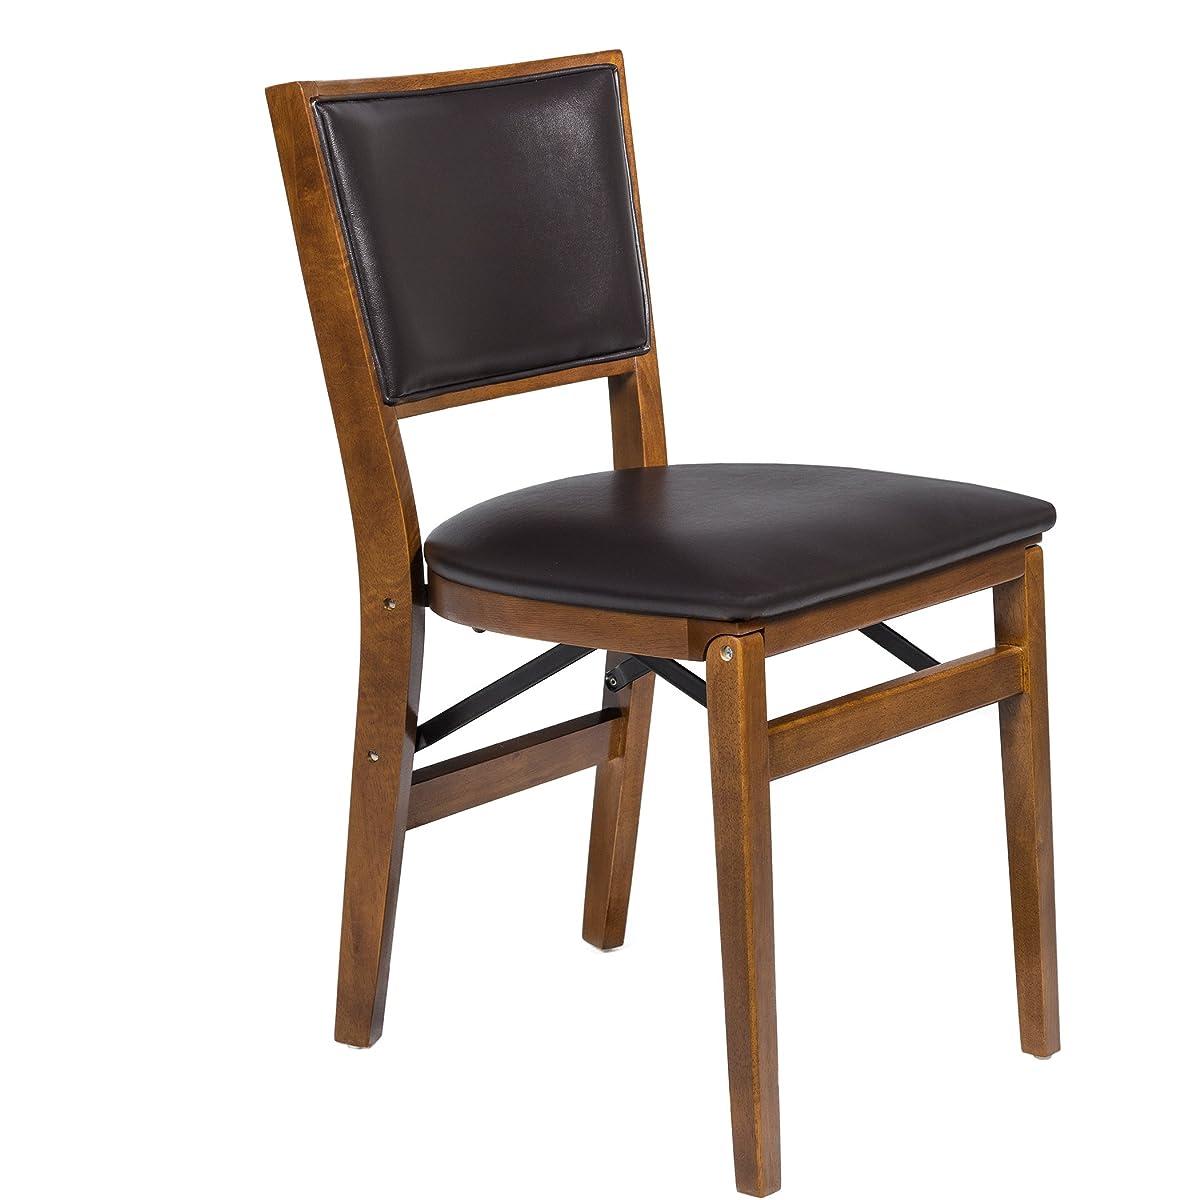 Stakmore Retro Upholstered Back Folding Chair Finish, Set of 2, Fruitwood